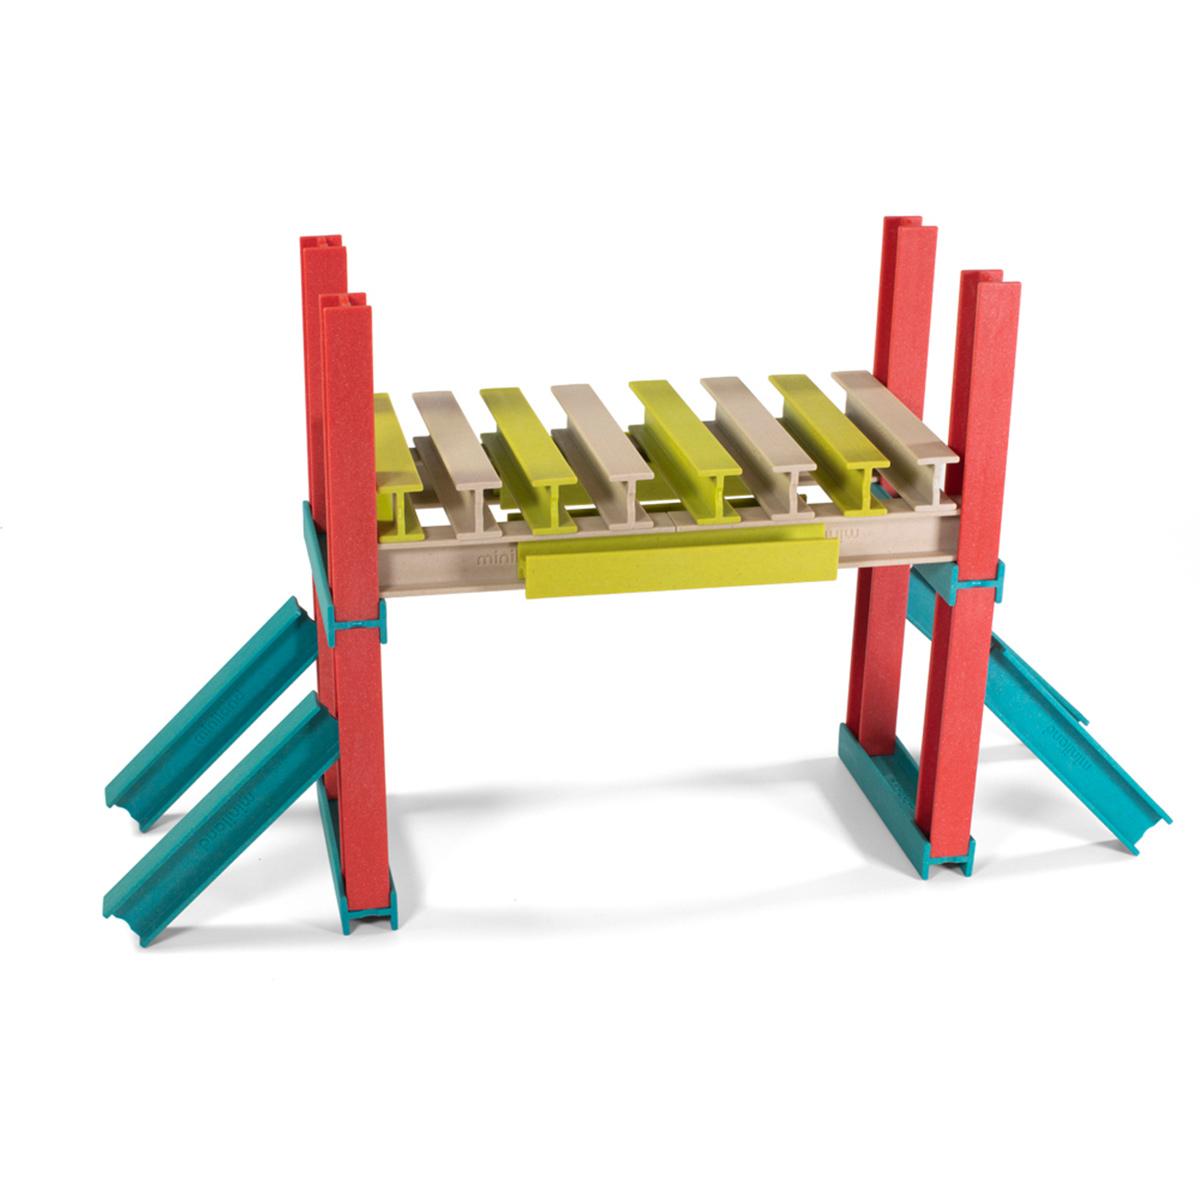 Builder Beam Set